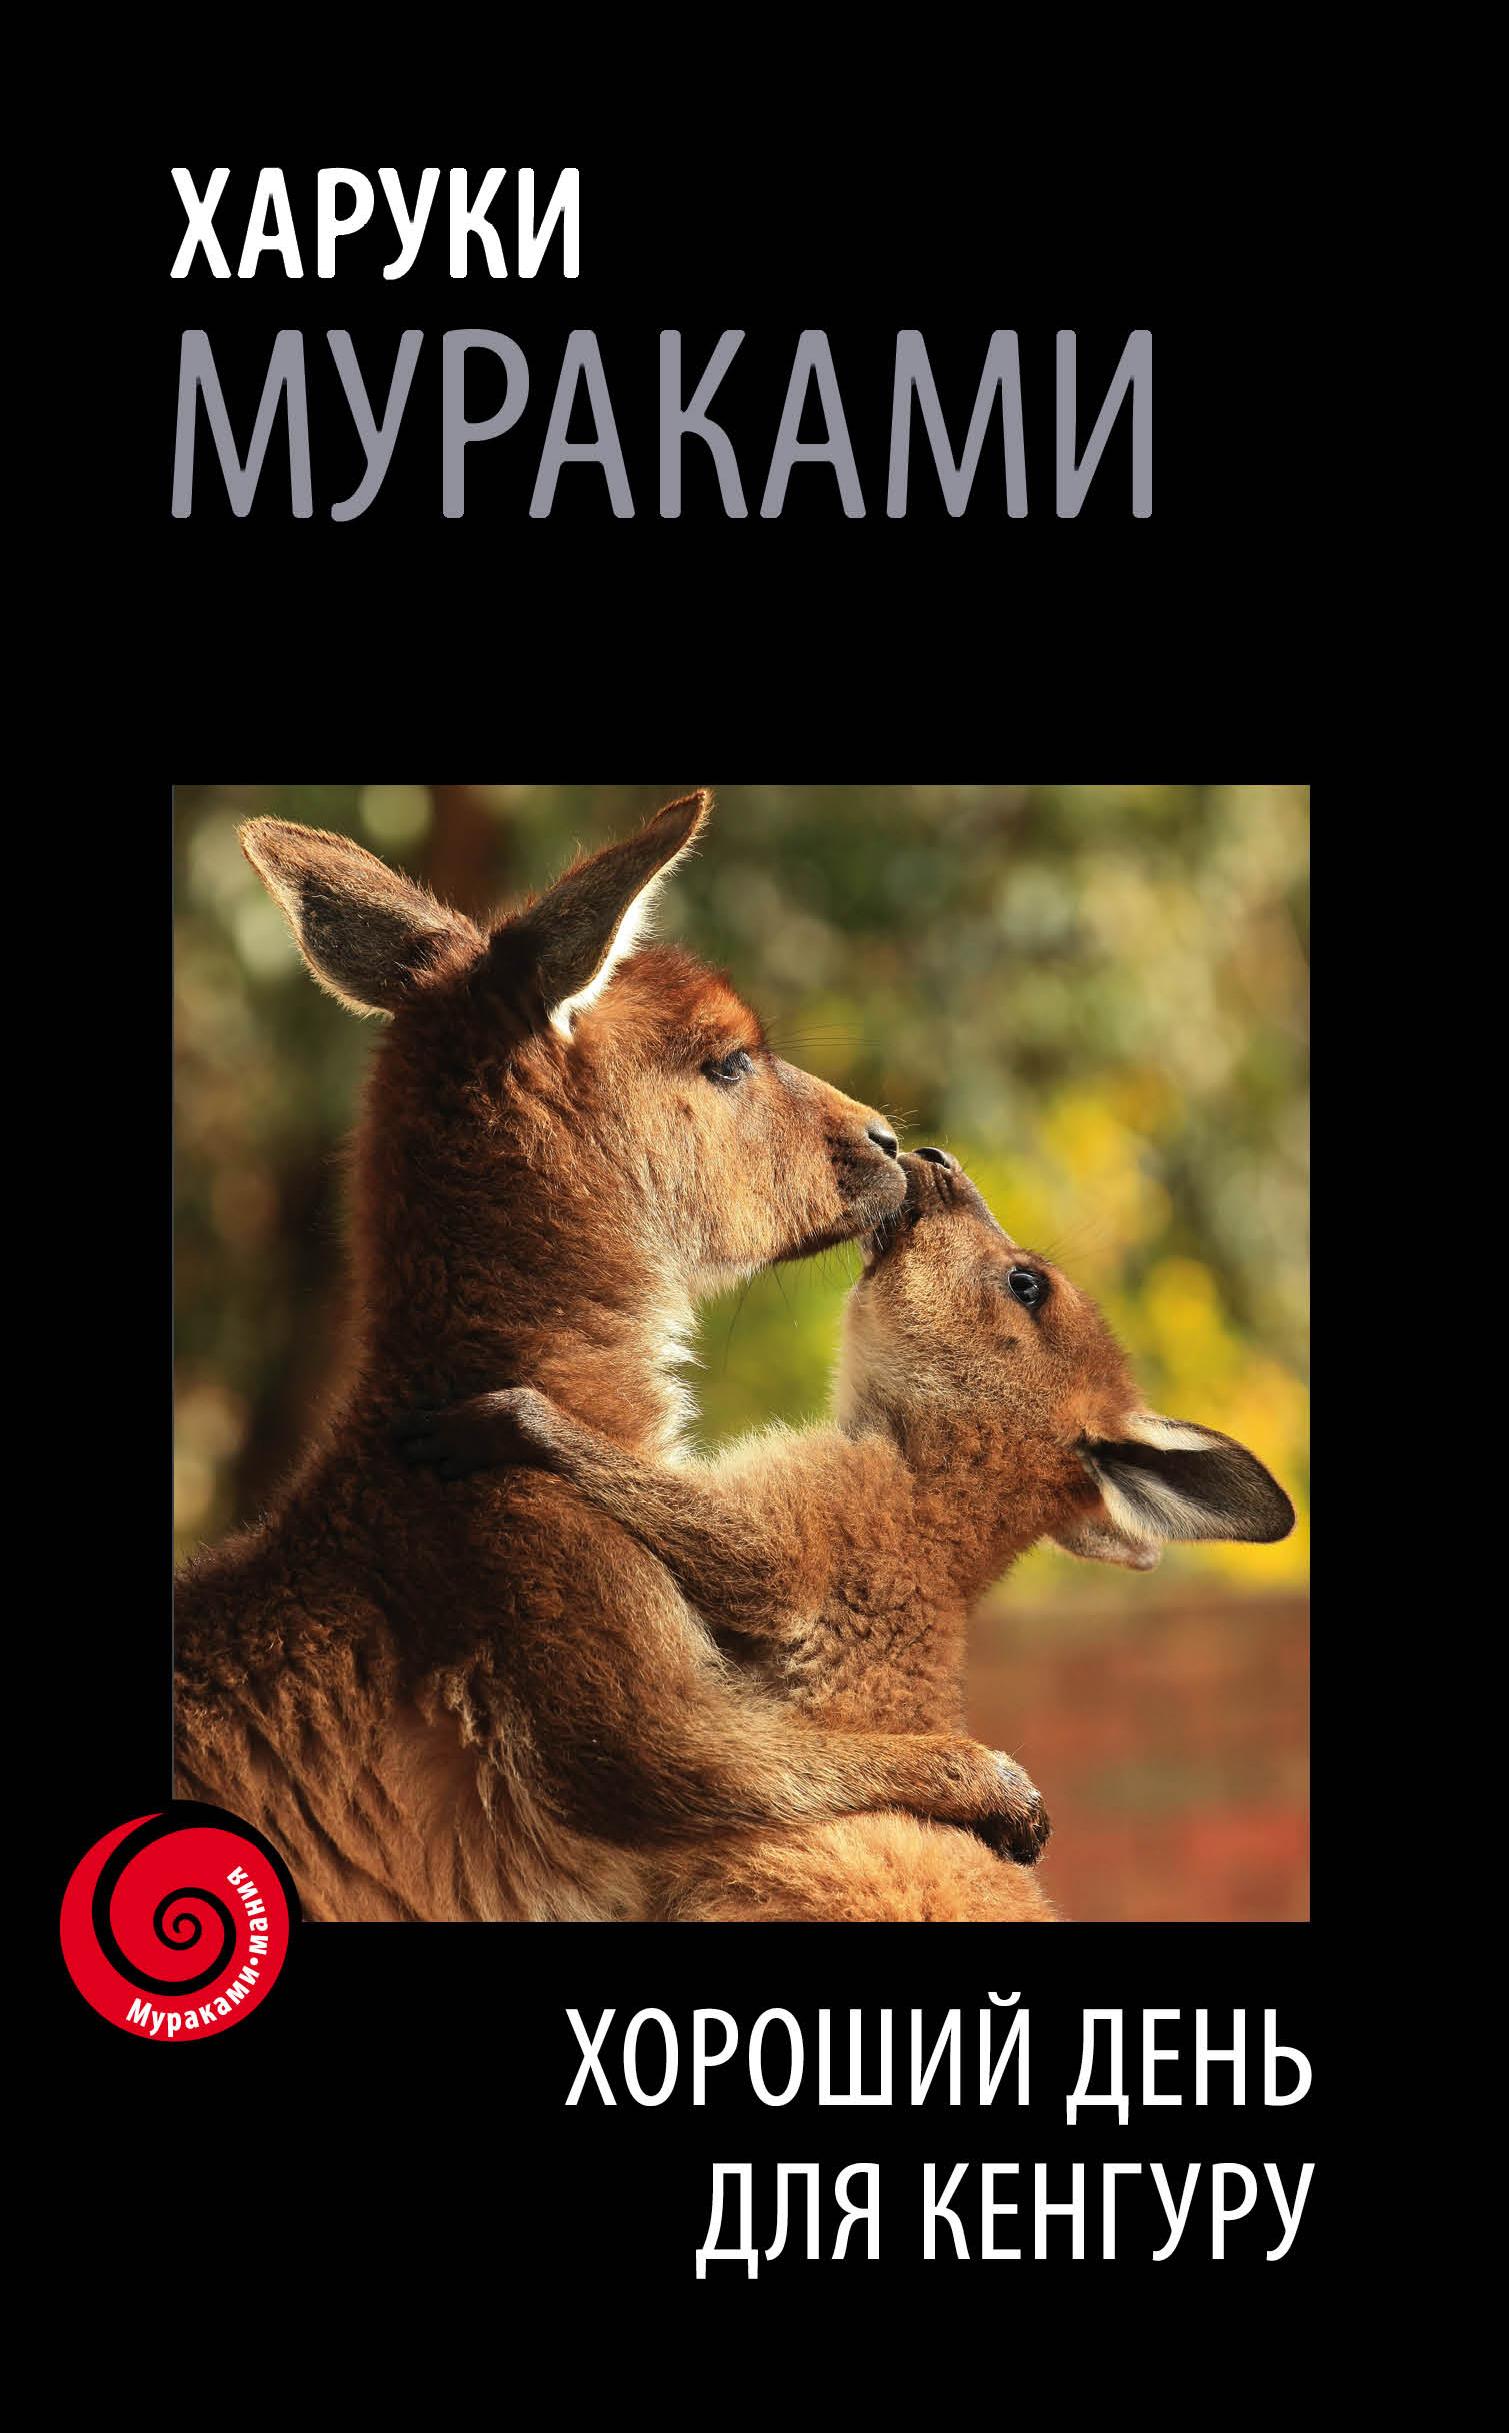 Мураками Харуки Хороший день для кенгуру